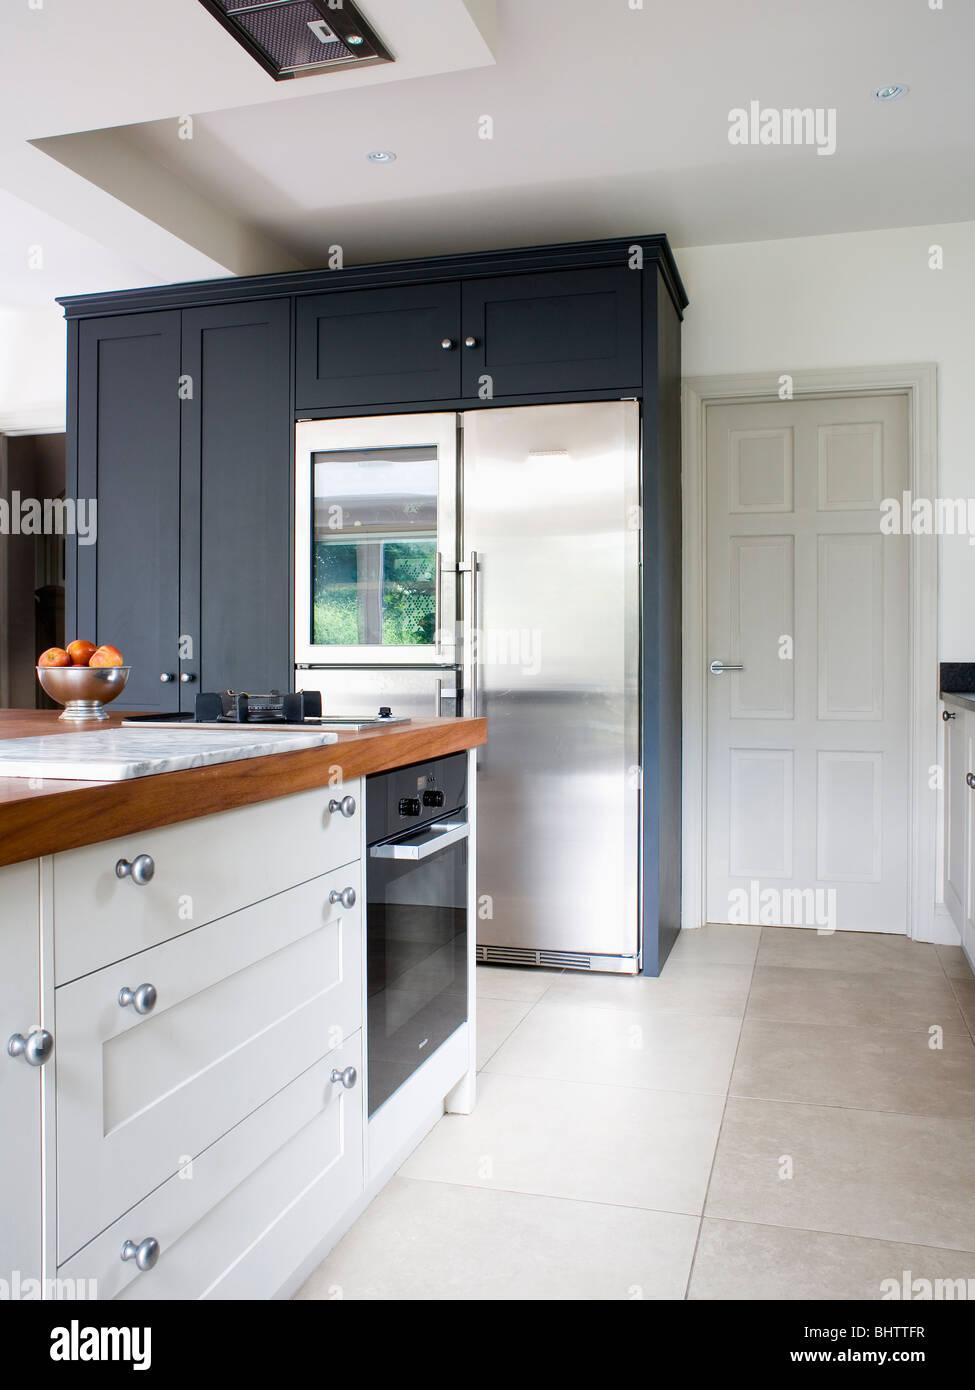 American style kitchen - Large Stainless Steel American Style Fridge Freezer In Modern White Kitchen